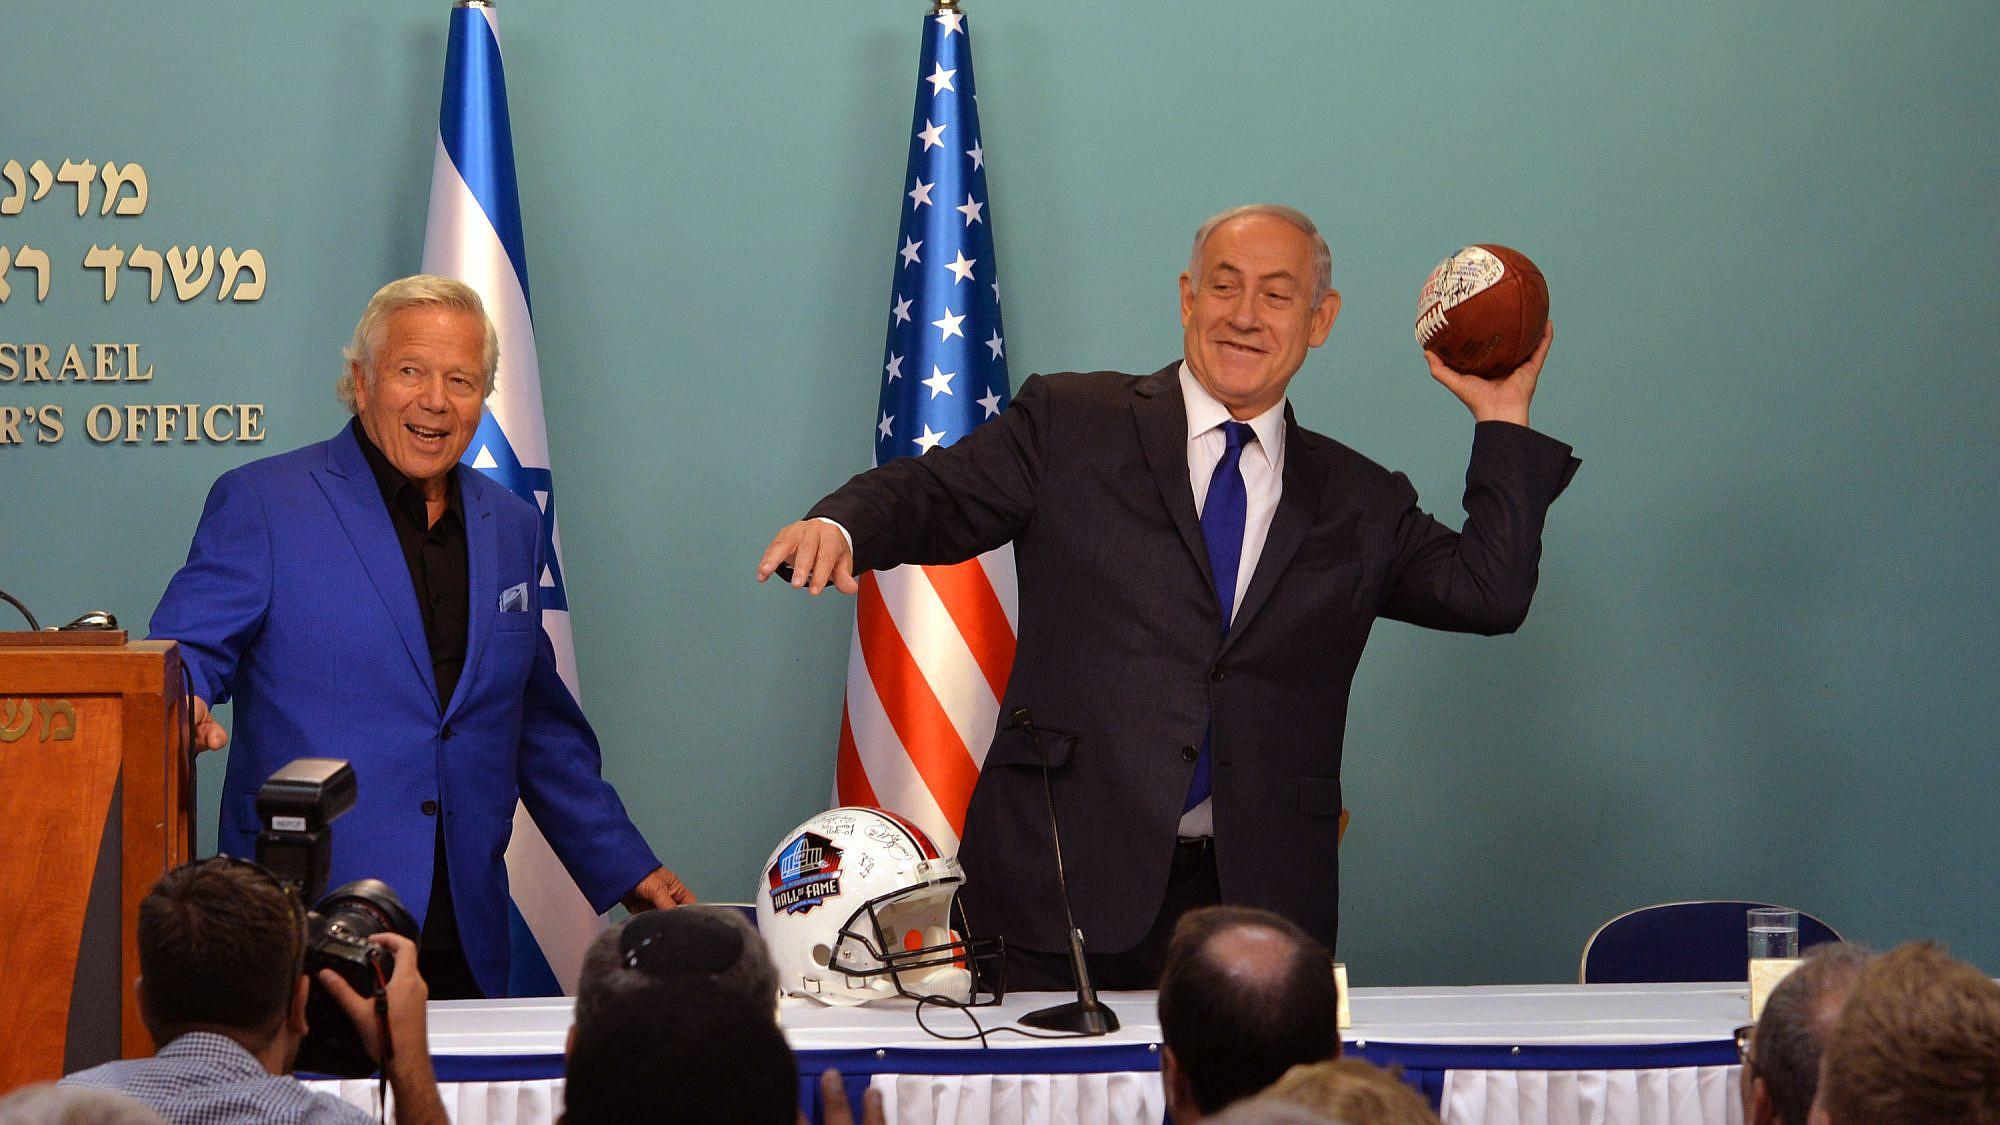 Israeli Prime Minister Benjamin Netanyahu meets with a delegation of NFL players lead by New England Patriots owner Robert Kraft, at Netanyahu's office in Jerusalem. June 20, 2017. Credit: Kobi Gideon / GPO